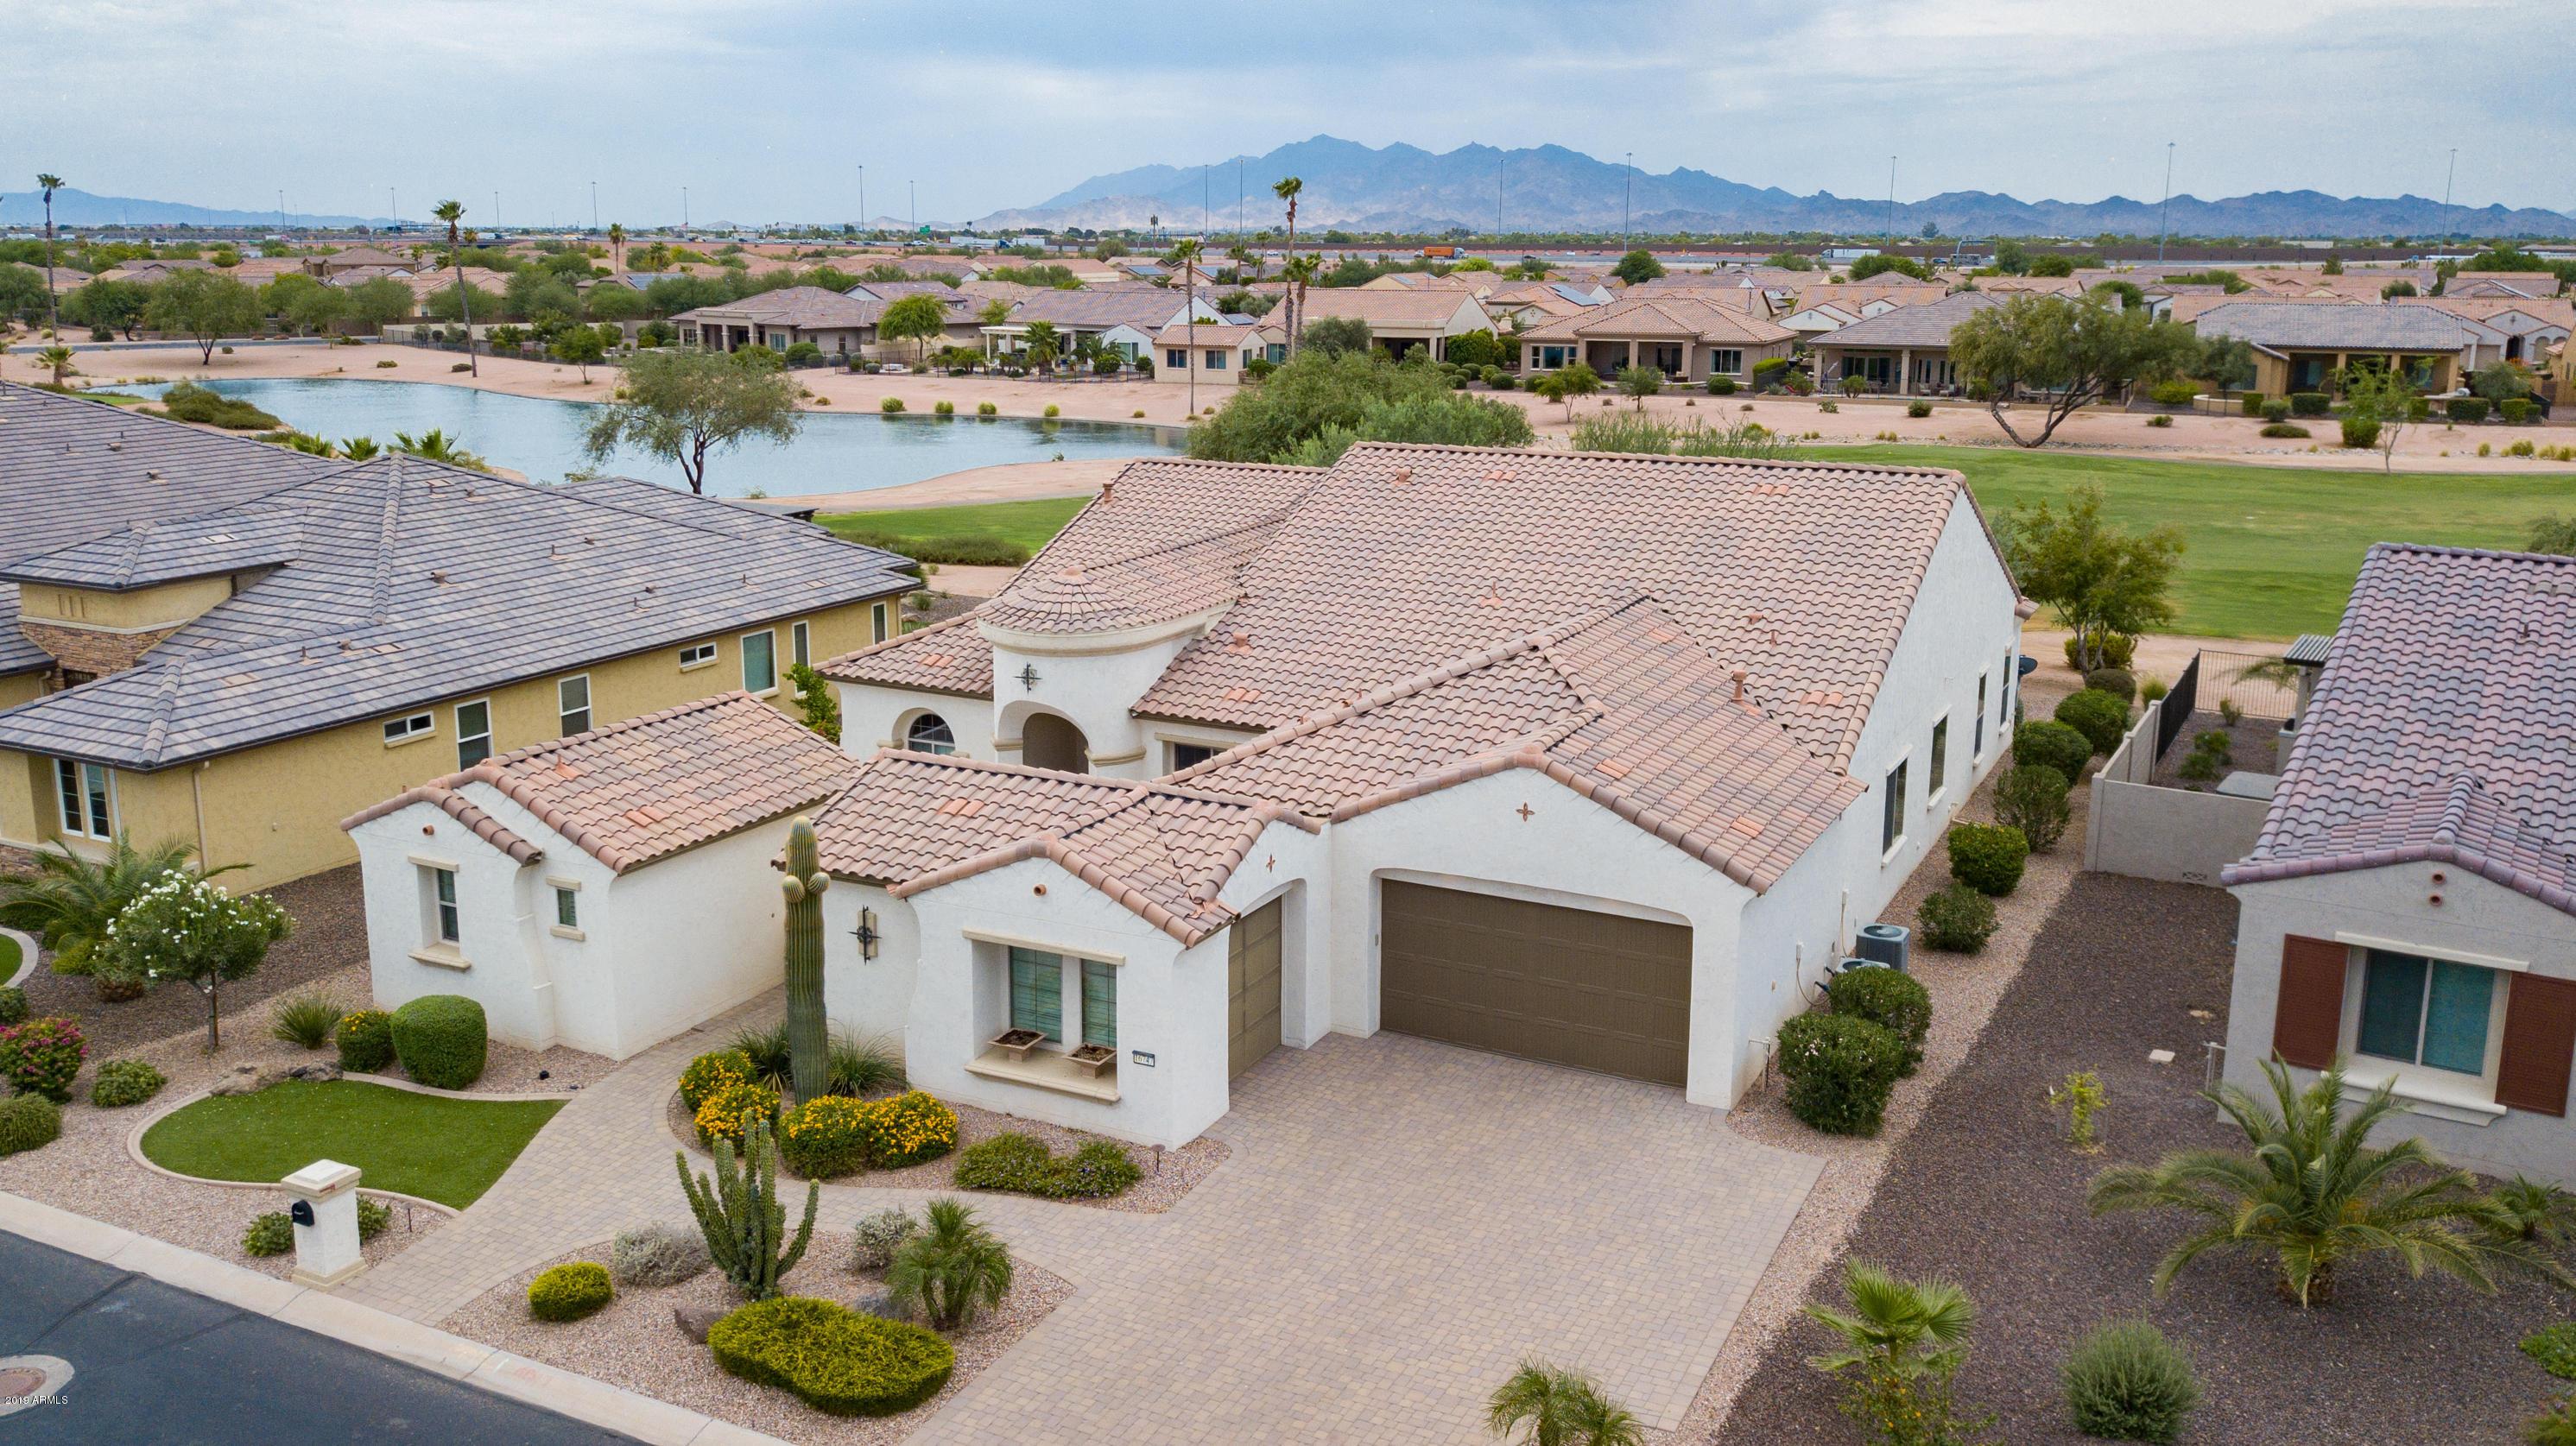 Photo of 16747 W HOLLY Street, Goodyear, AZ 85395